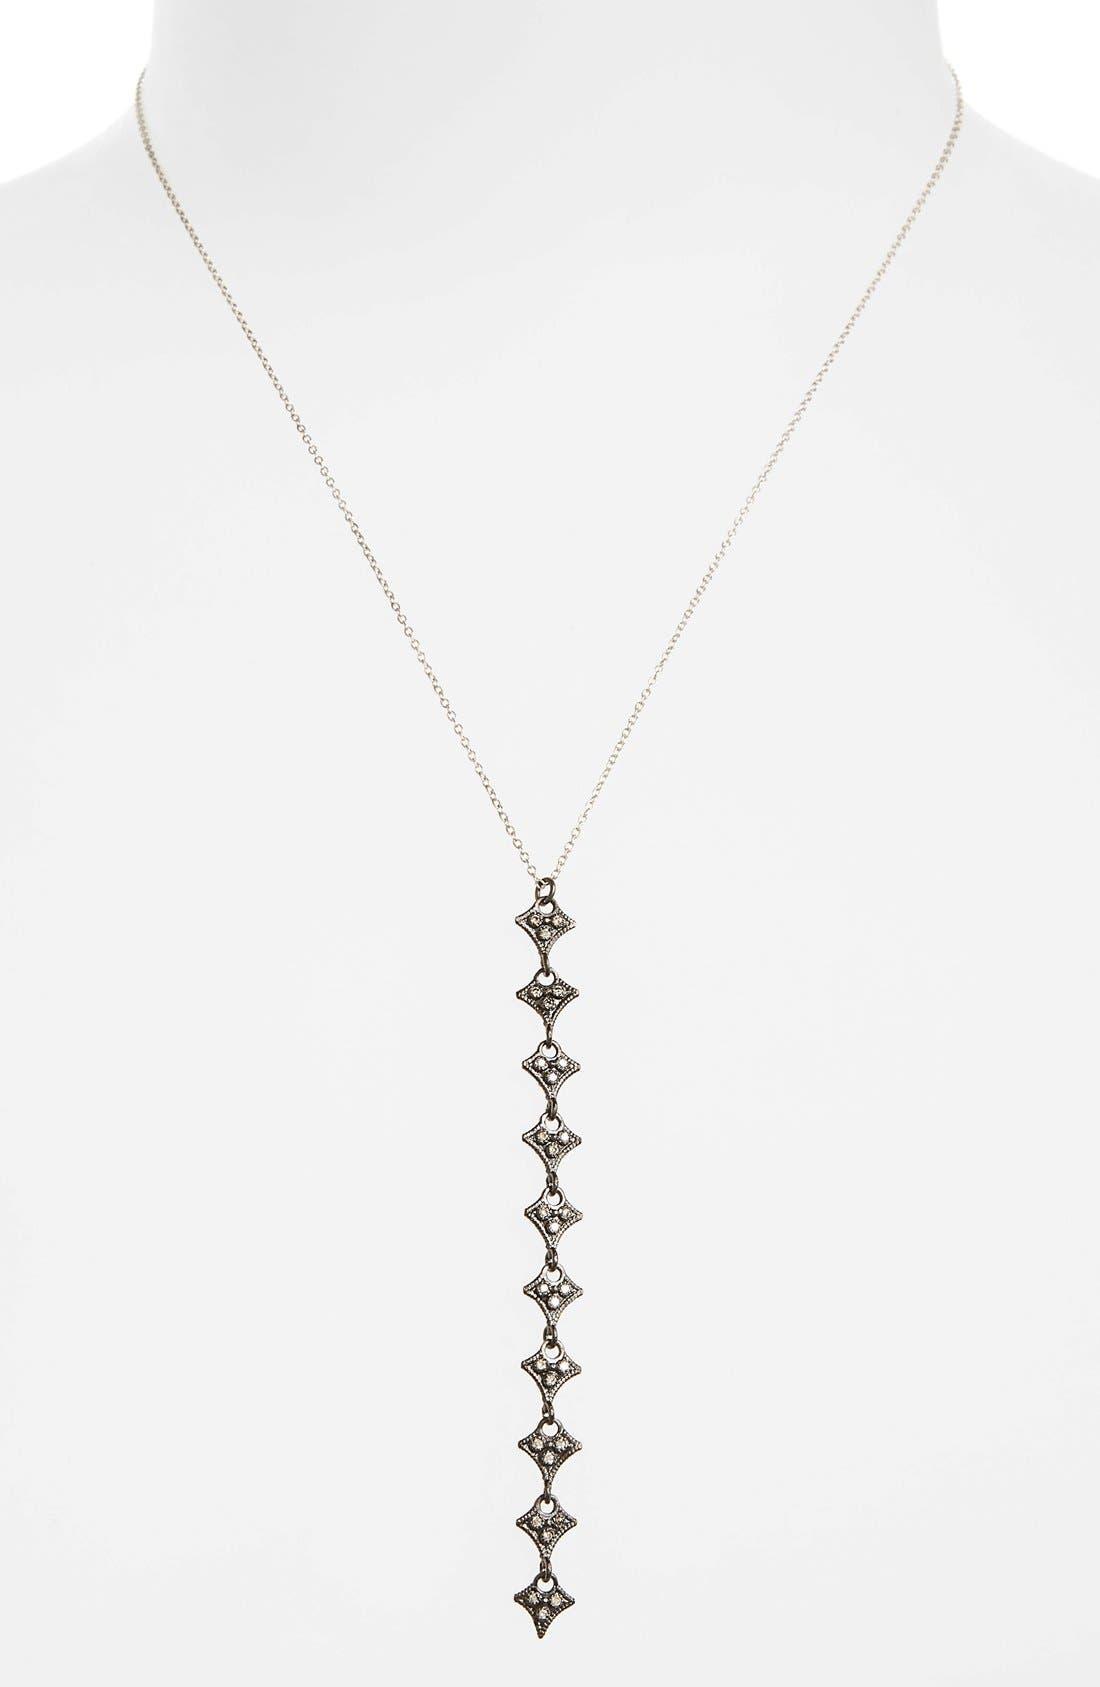 Main Image - Armenta New World Crivelli Diamond Y-Necklace